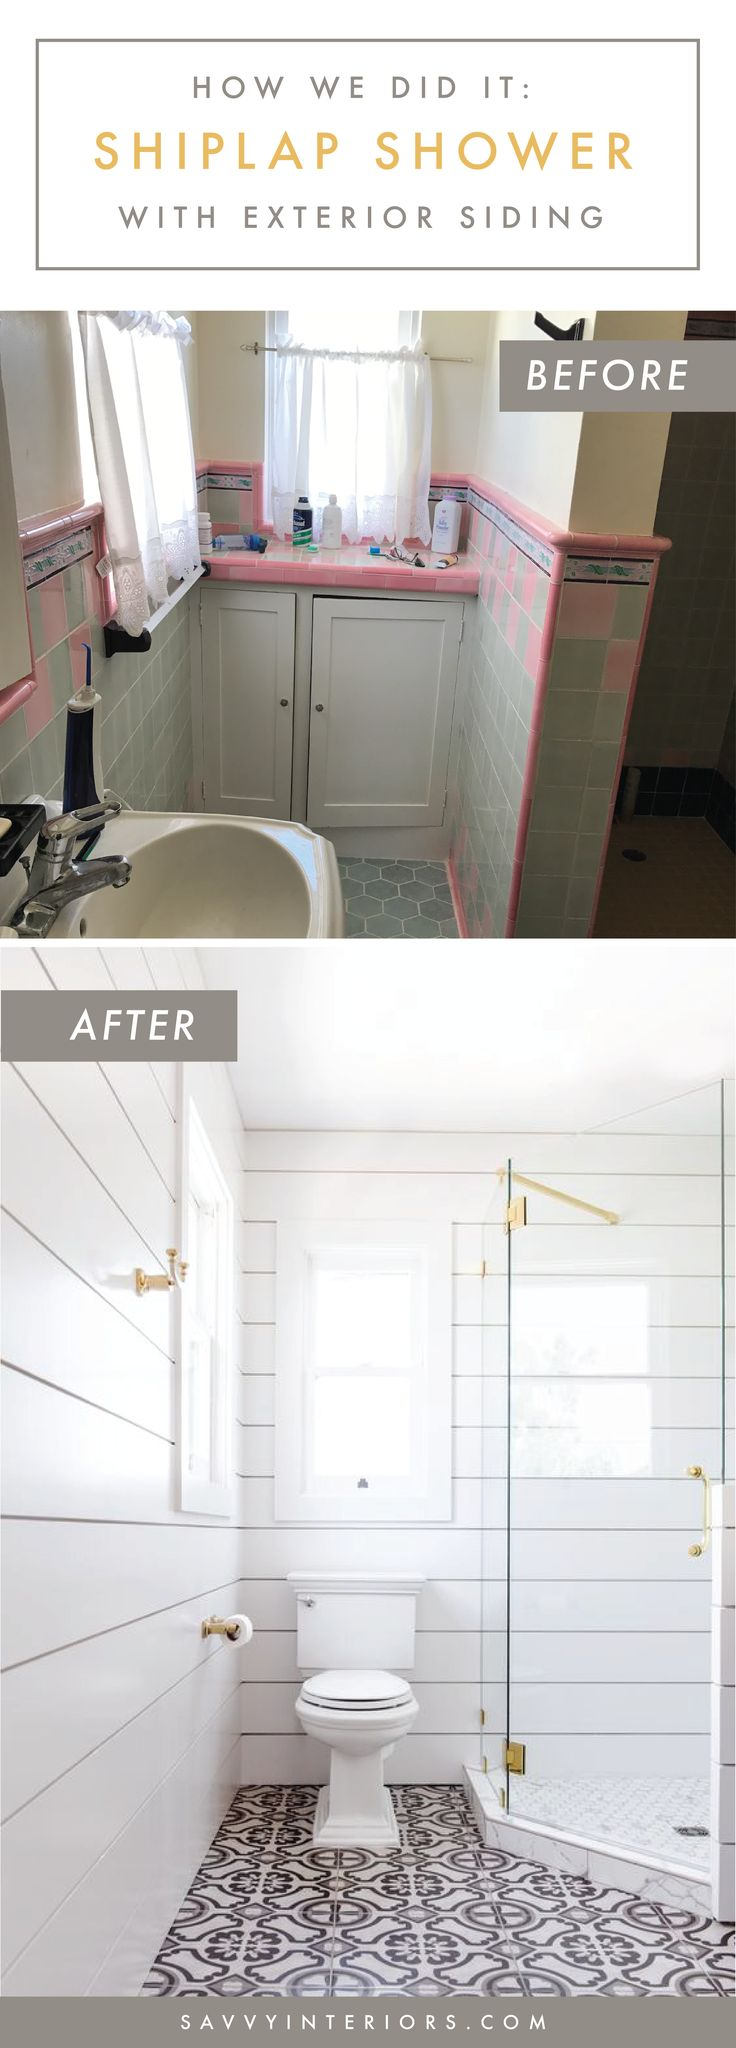 Best 25 white shiplap ideas on pinterest shiplap for Bathroom stores san diego